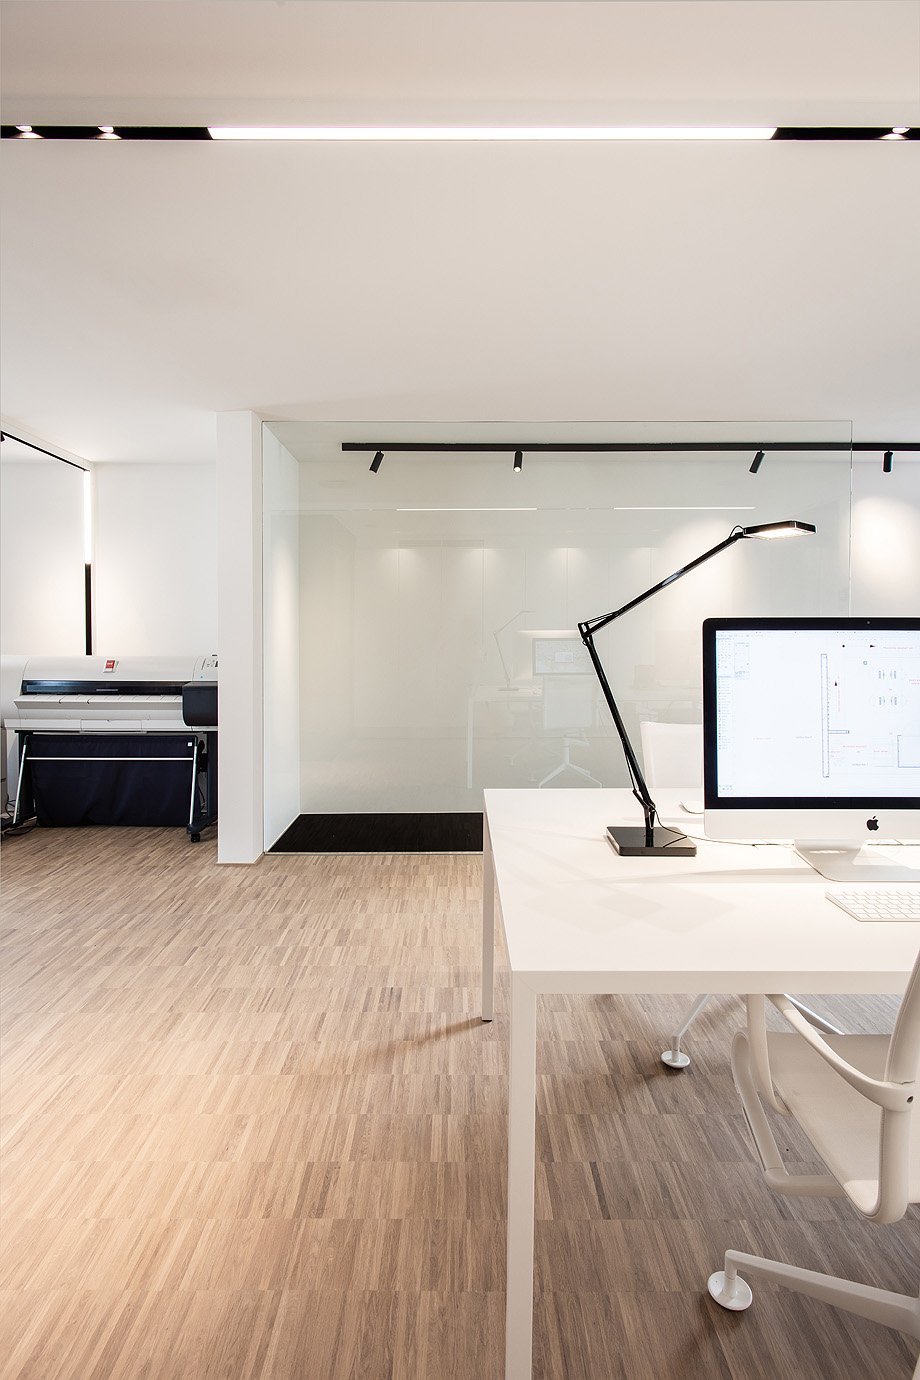 oficina de arquitectura de klaarchitectuur - foto valerie clarysse (4)